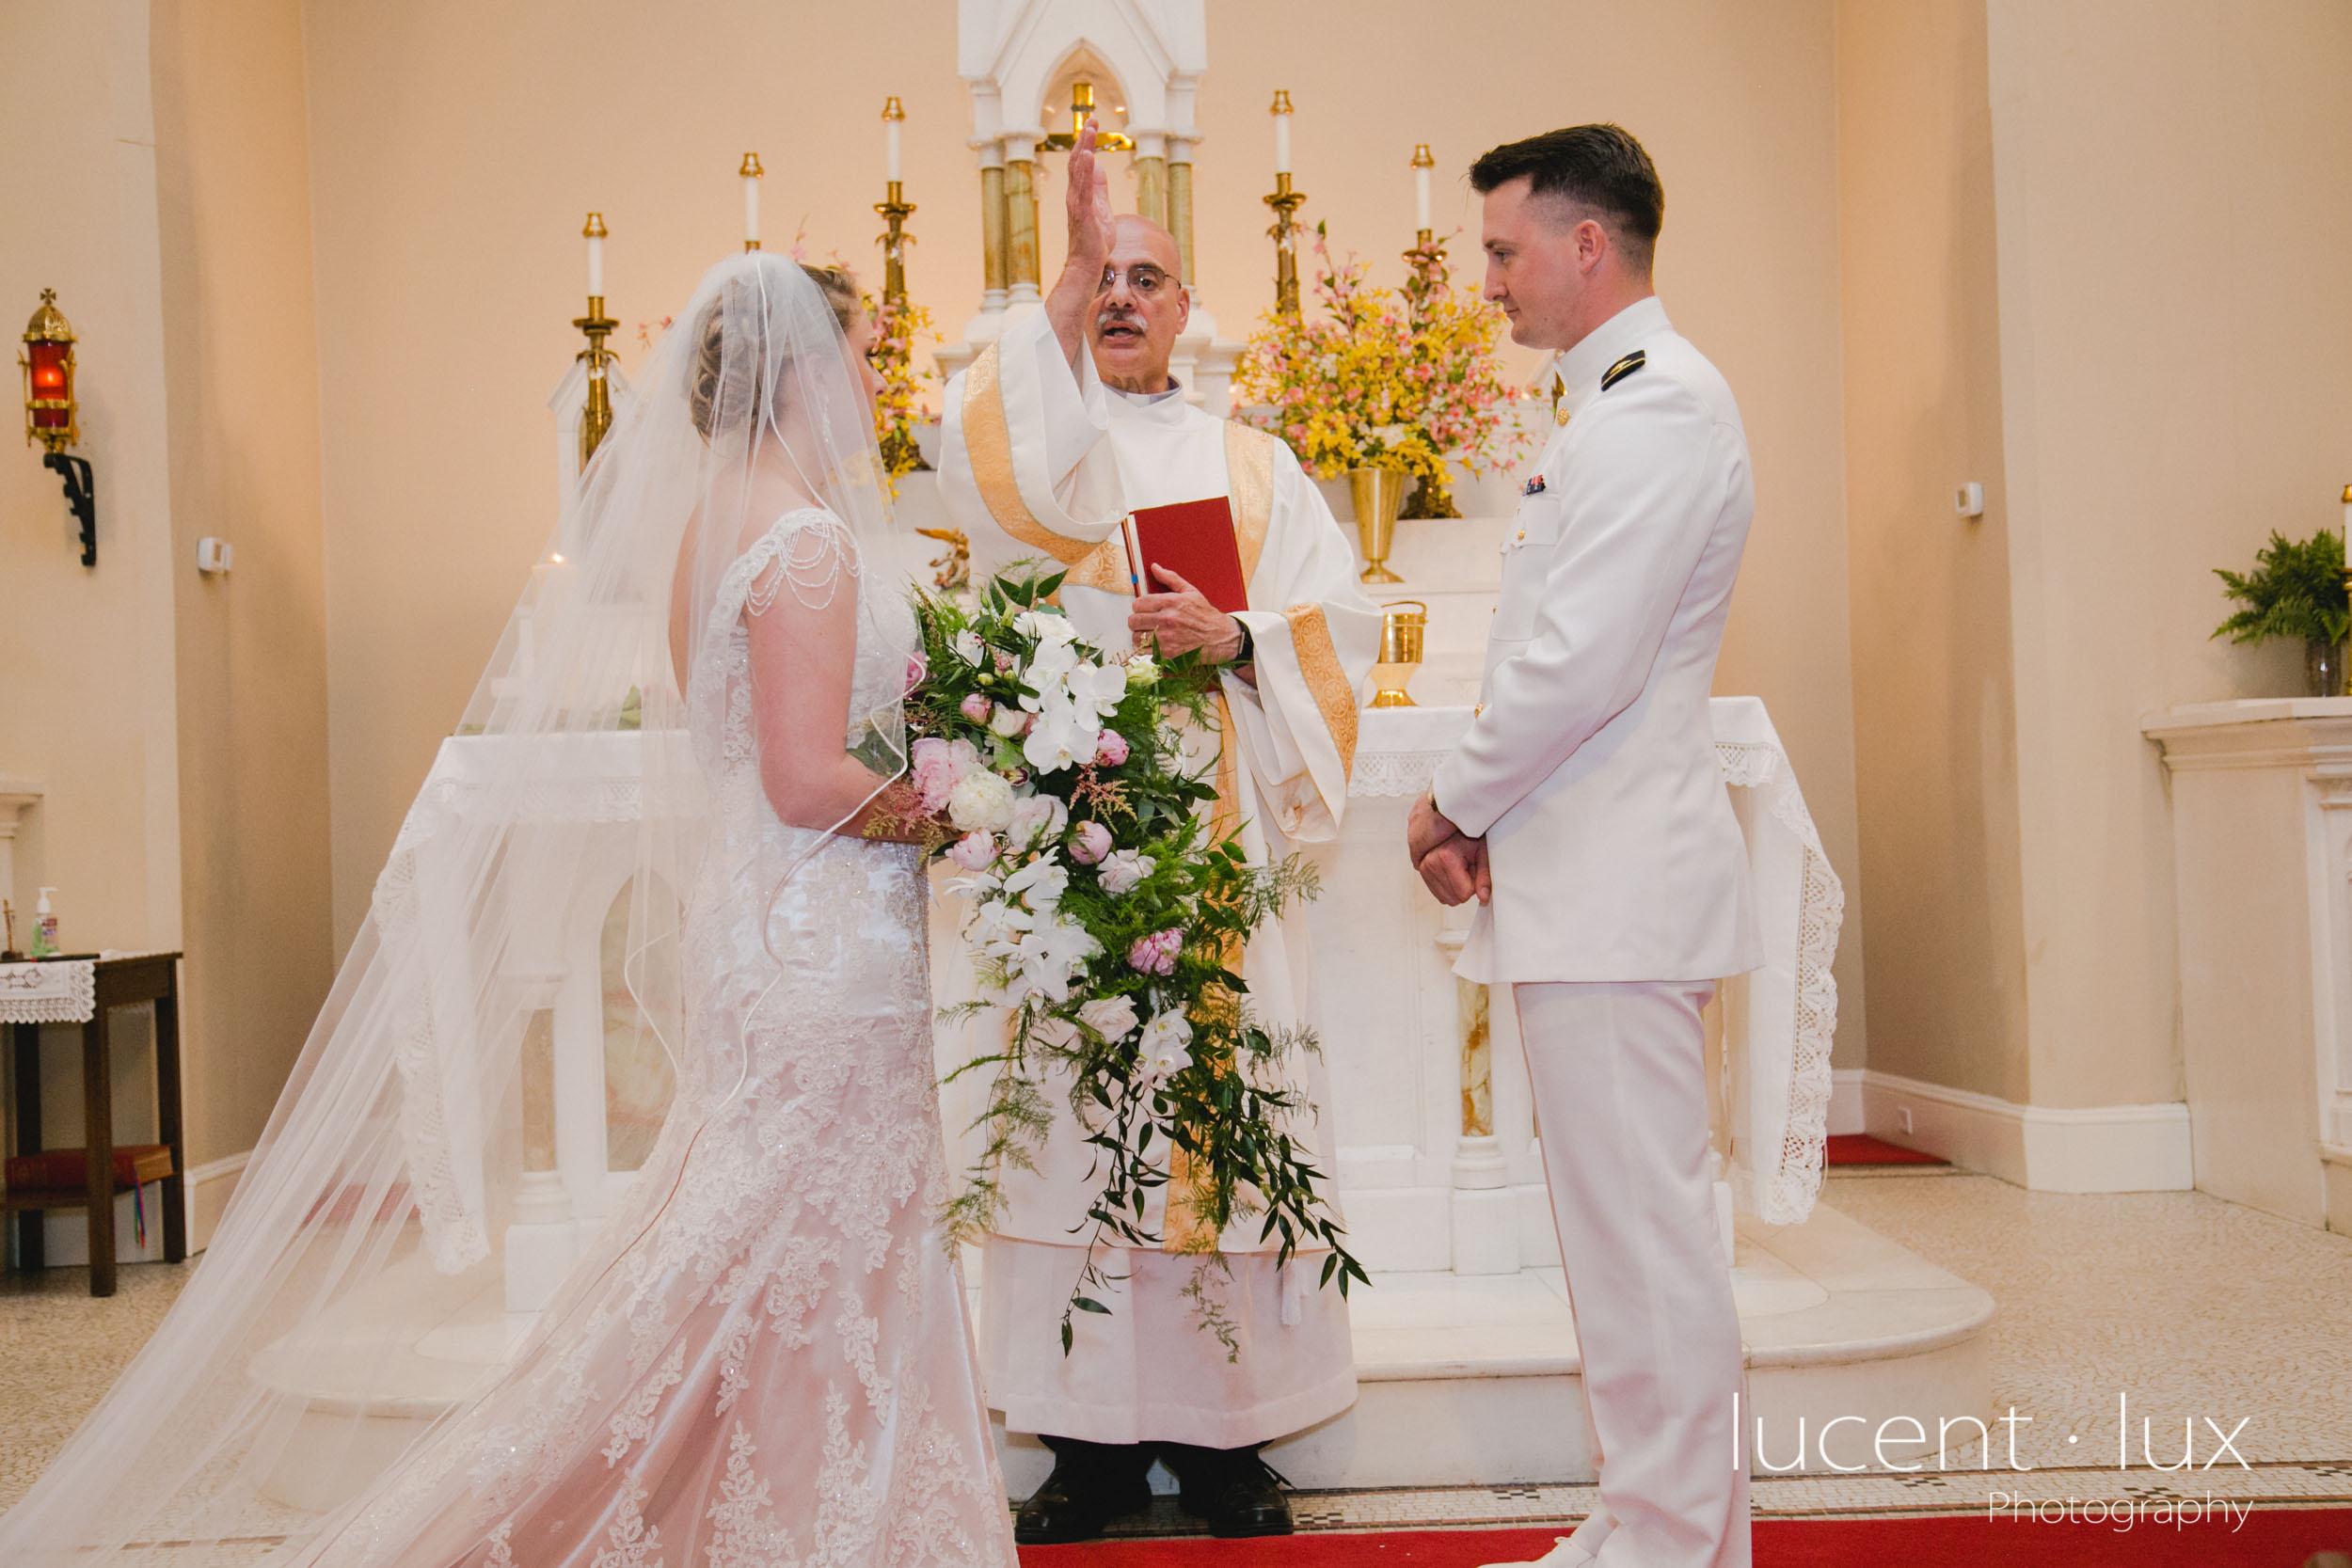 Wedding-Photography-Maryland-Pennsylvania-Photographer-Mendenhall-Inn-Media-Portrait-Event-125.jpg